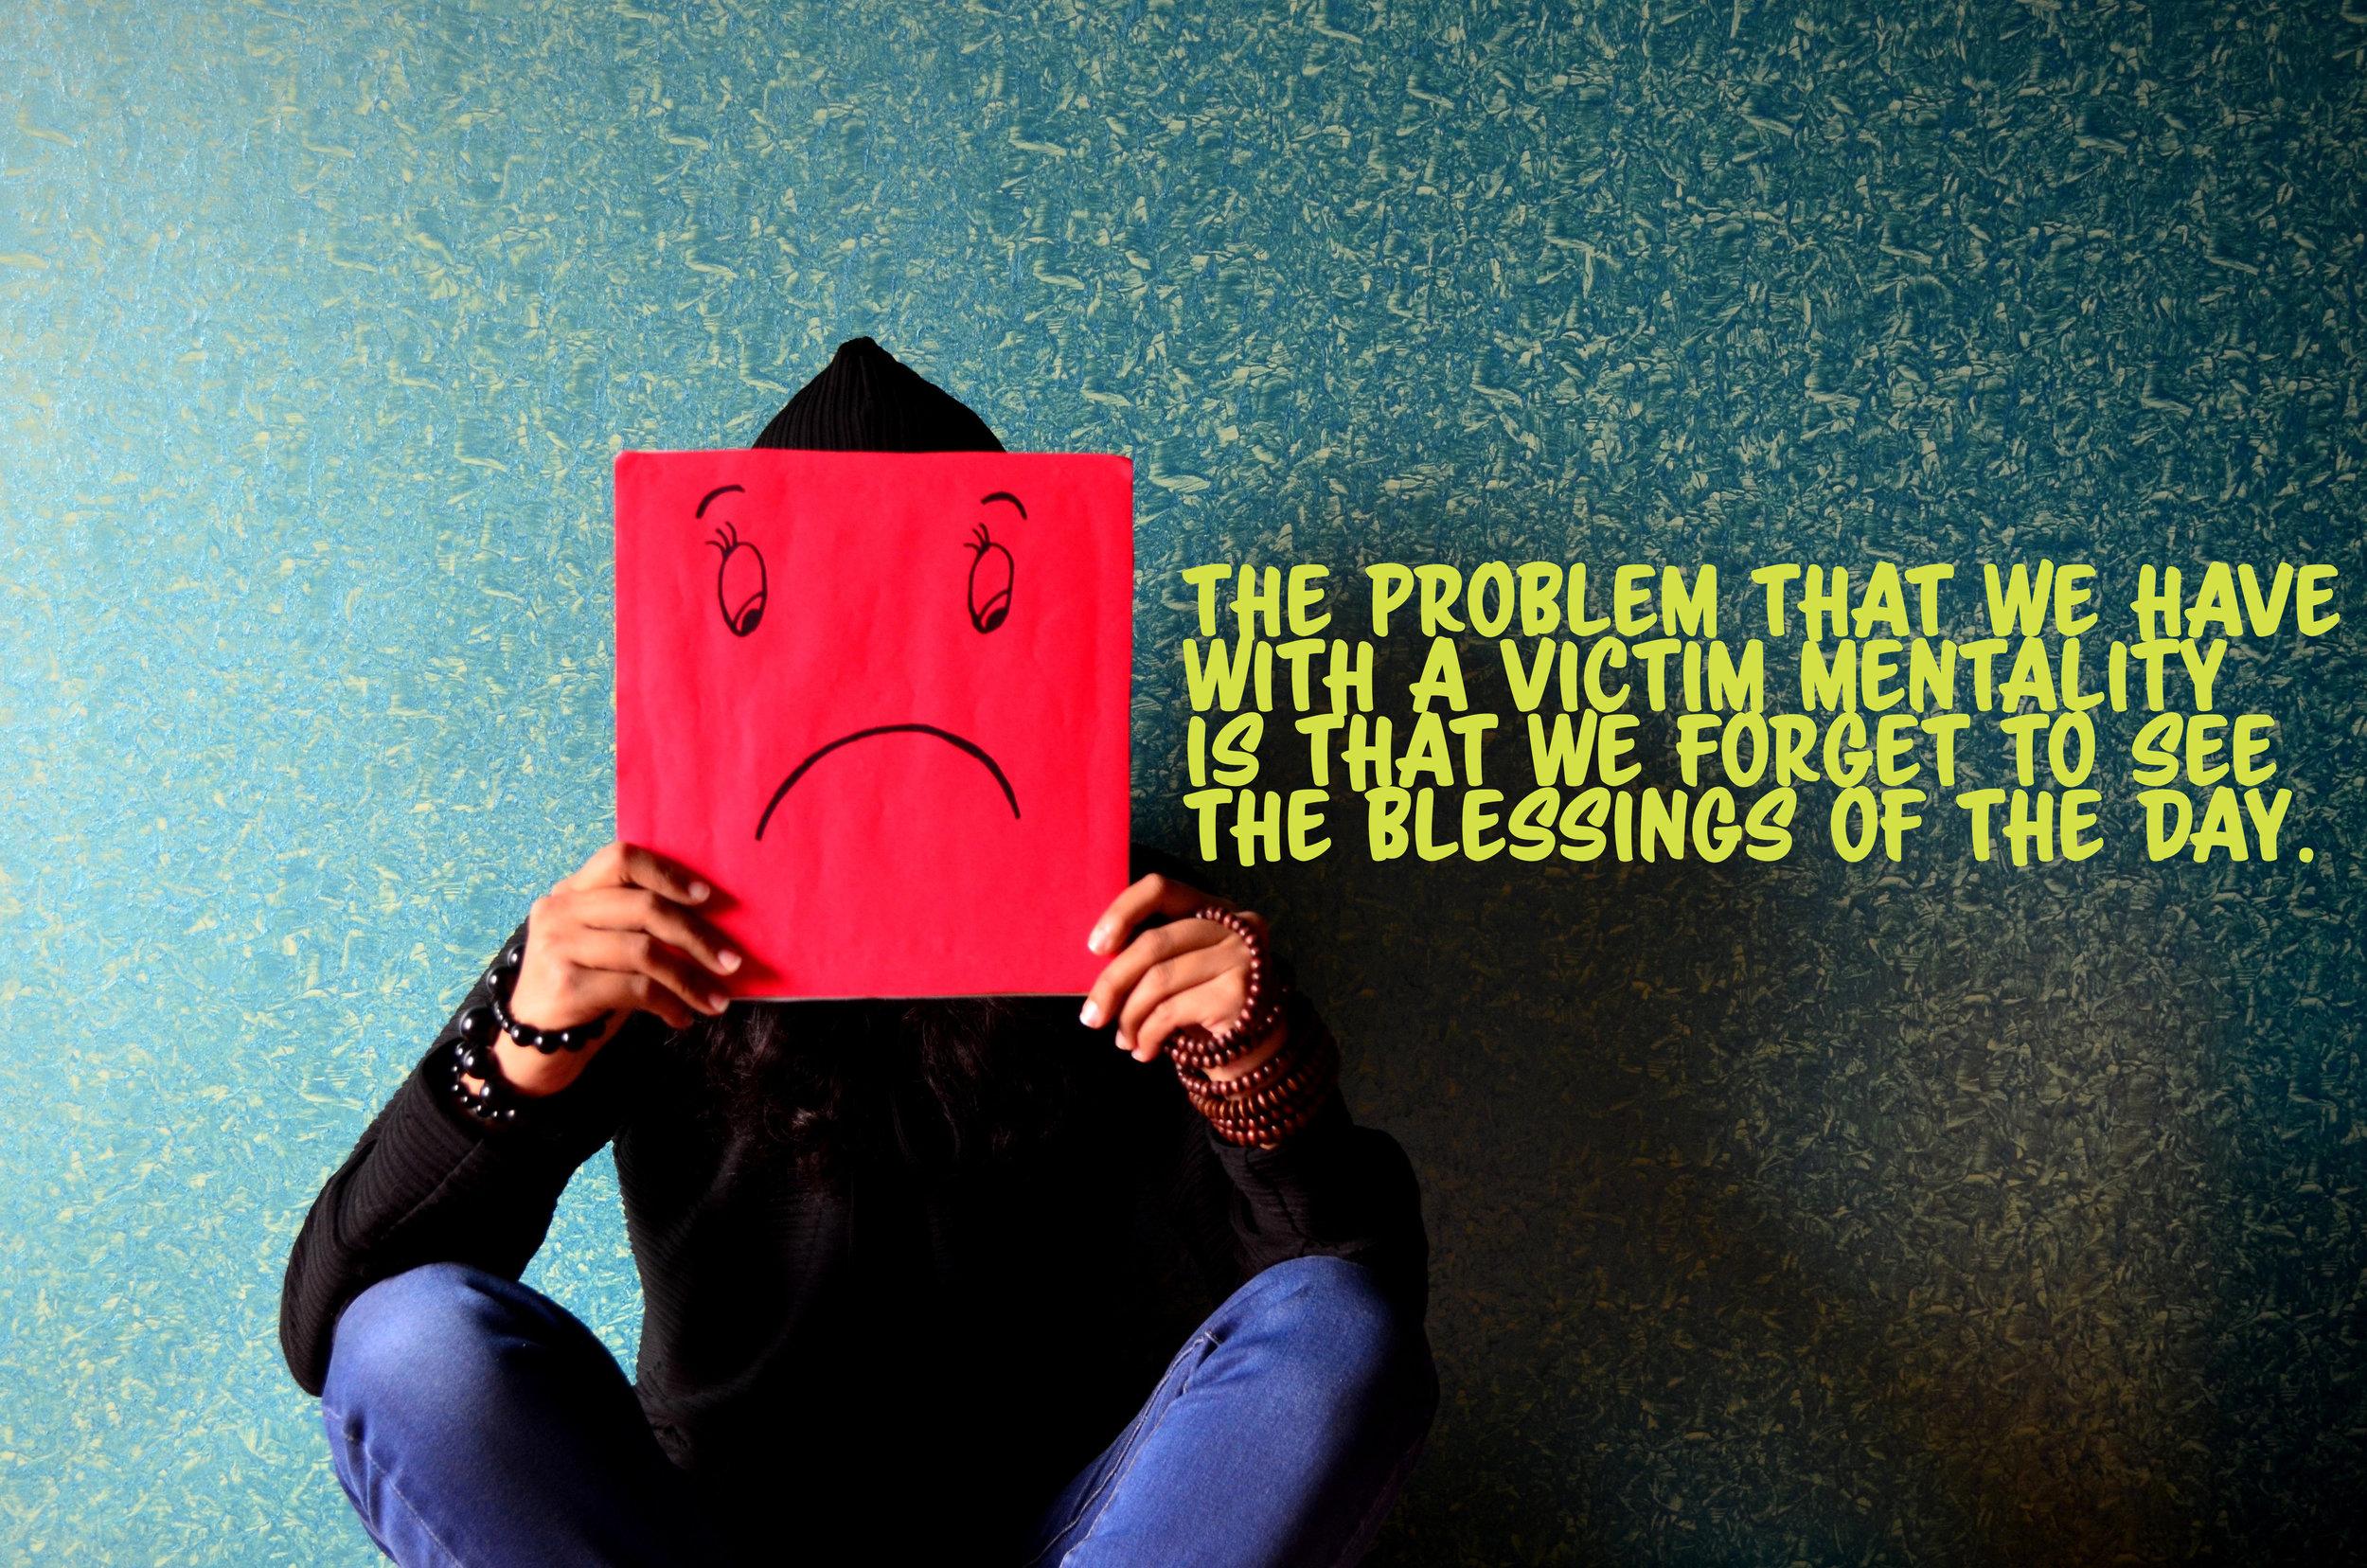 Victim Mentality Article Image.jpg